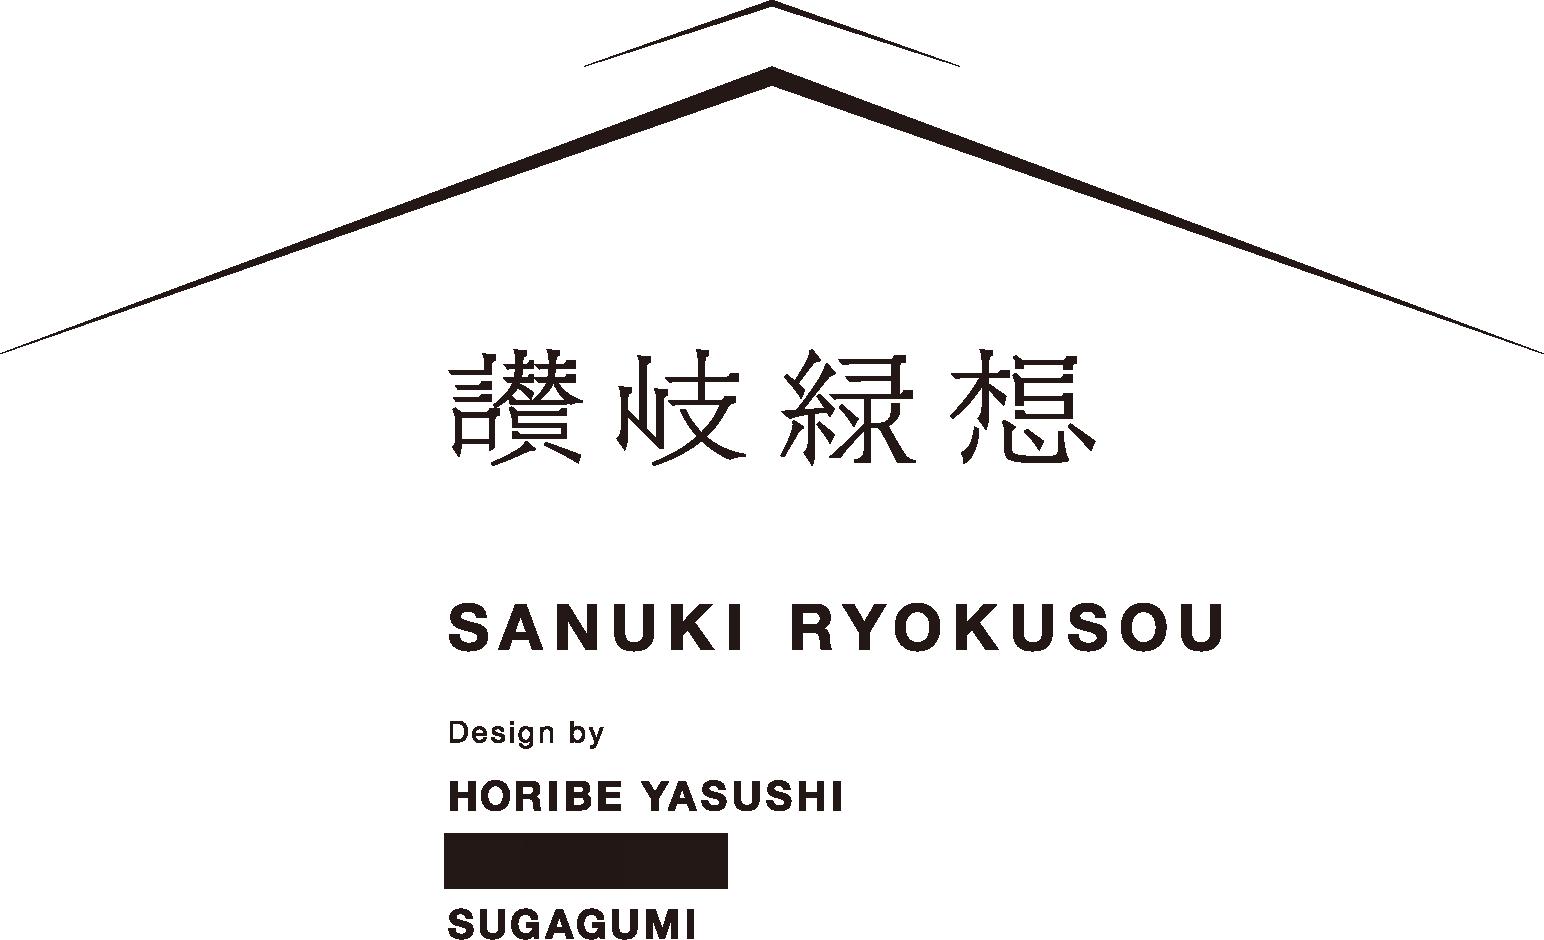 SANUKI RYOKUSOU